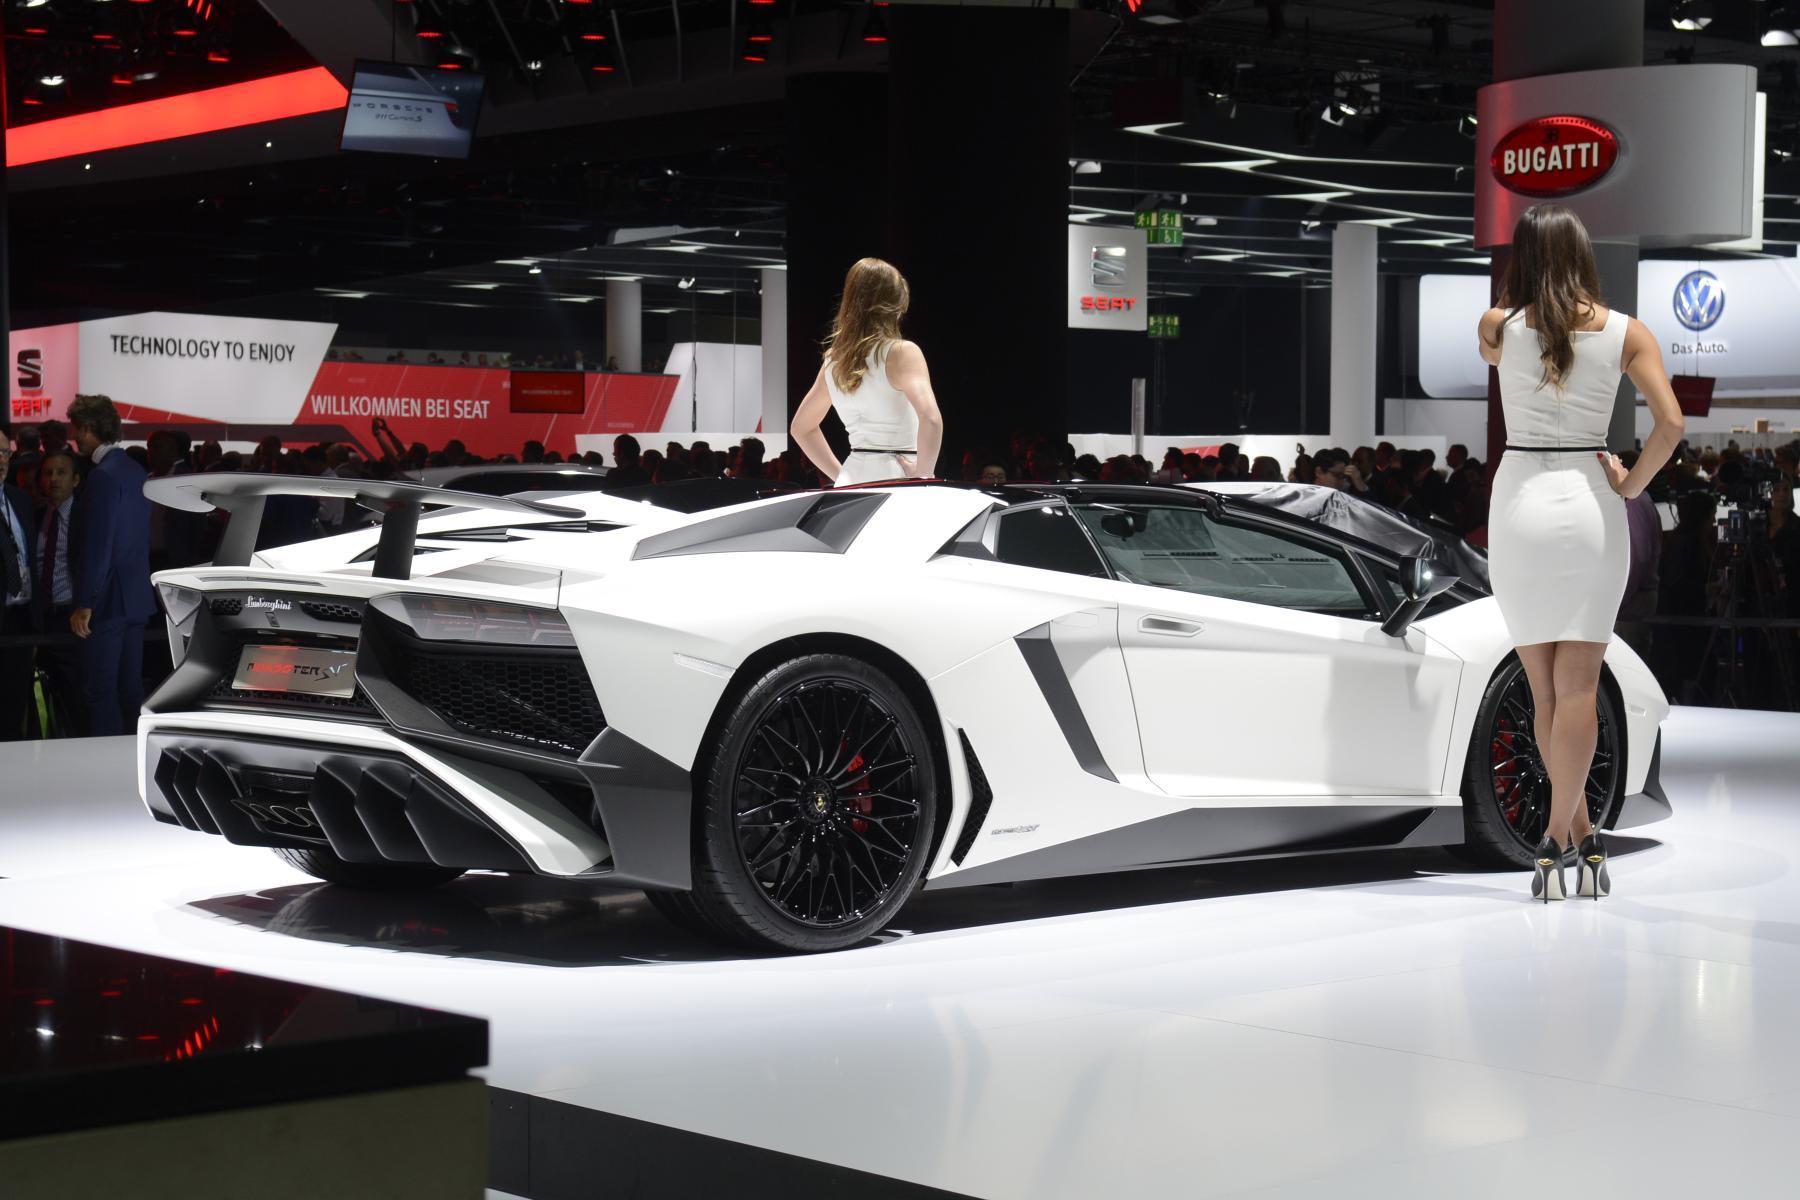 Iaa 2015 Lamborghini Aventador Sv Roadster